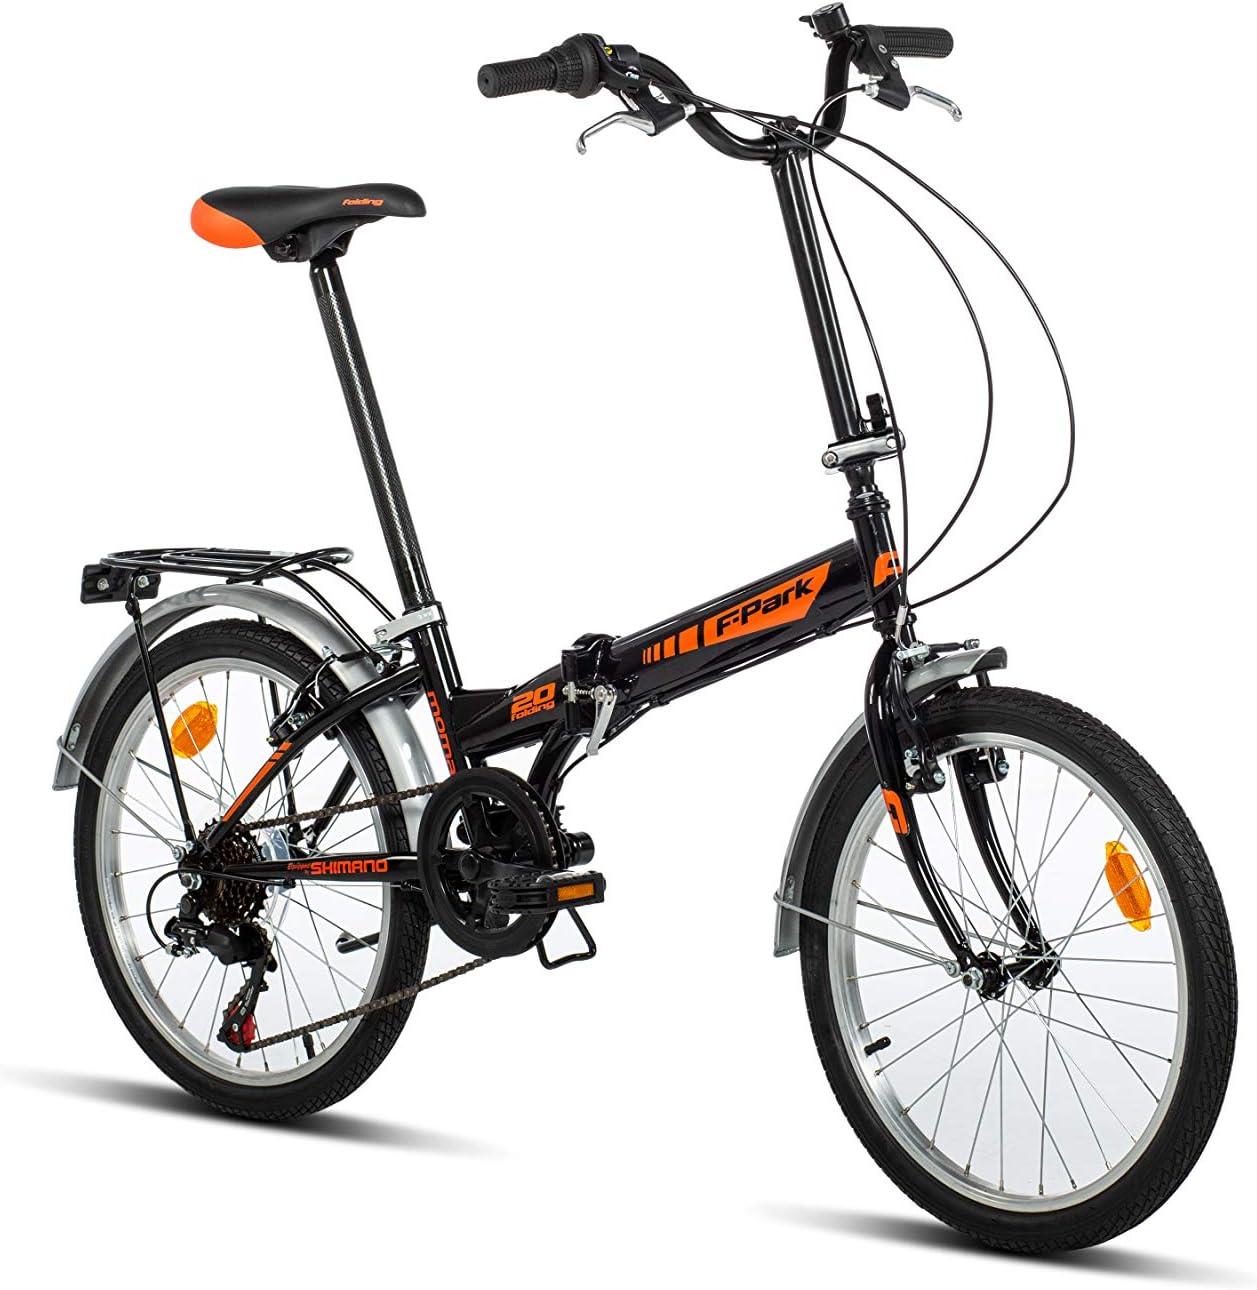 Moma bikes bicicleta plegable urbana folding park shimano 6v